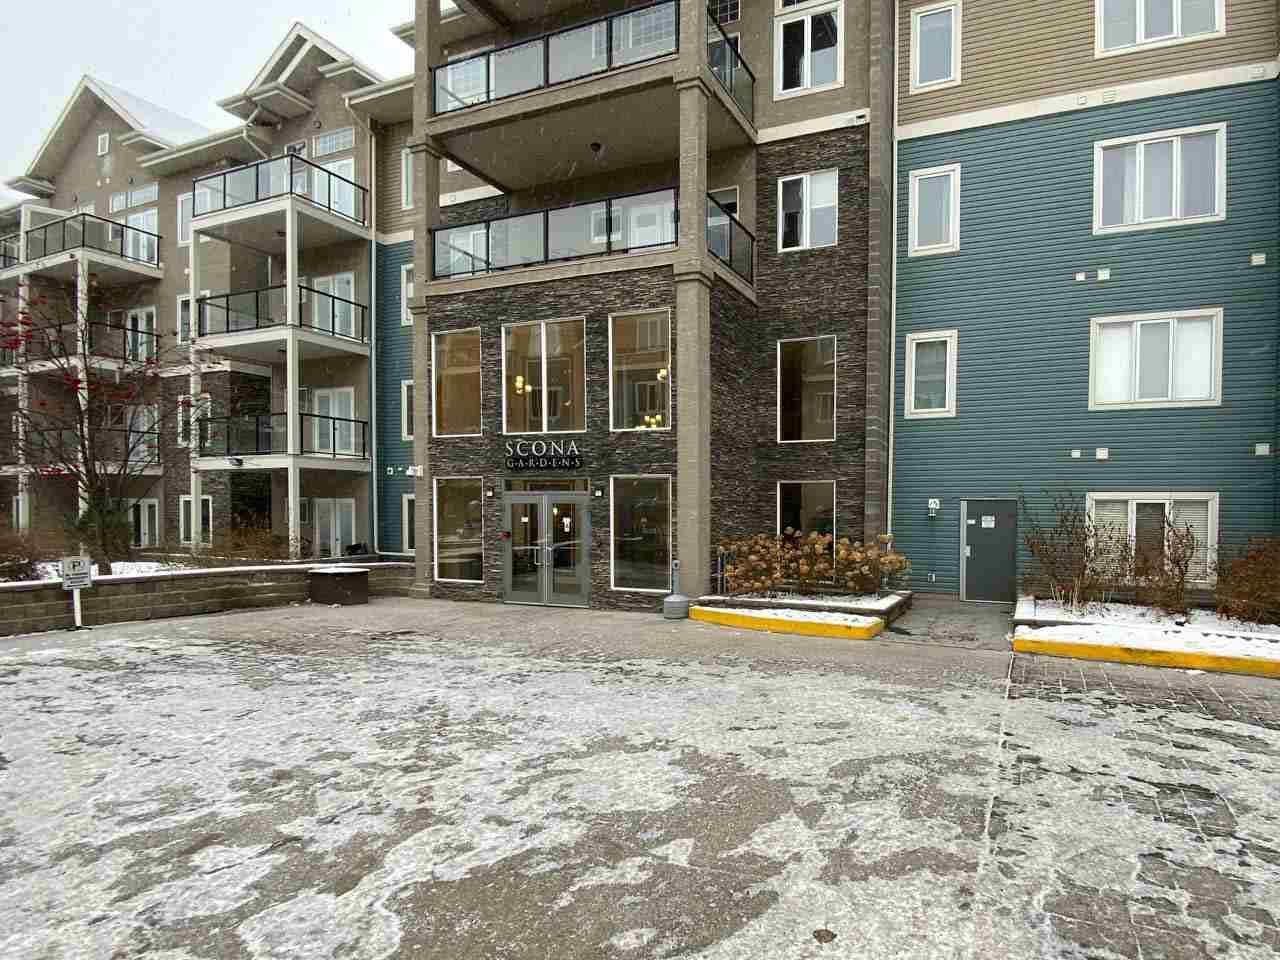 221 - 10121 80 Avenue Nw, Edmonton   Image 1